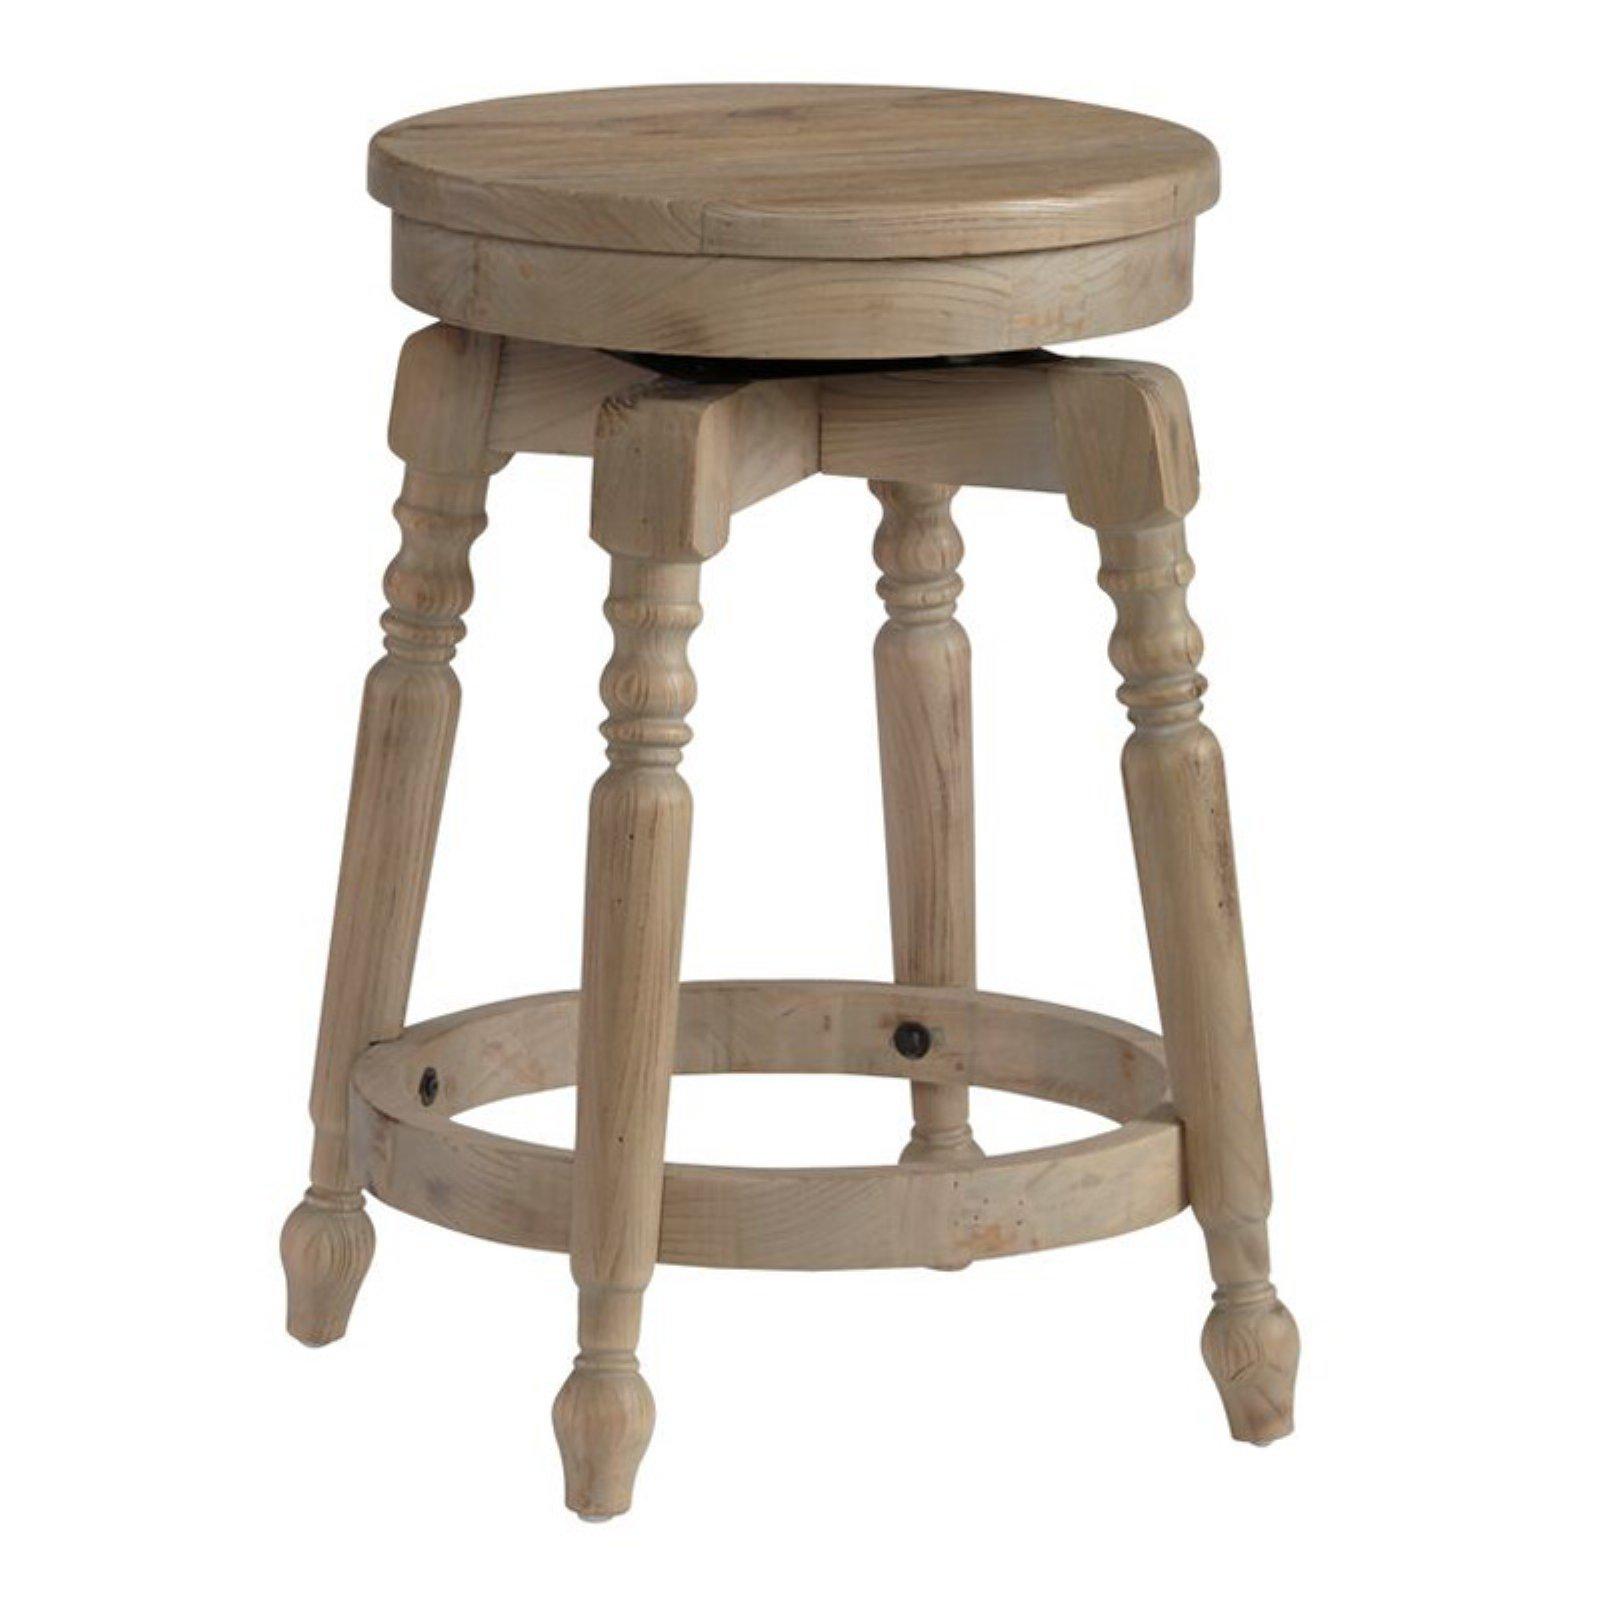 Progressive Furniture Hatley 24 In Swivel Counter Stool Stool